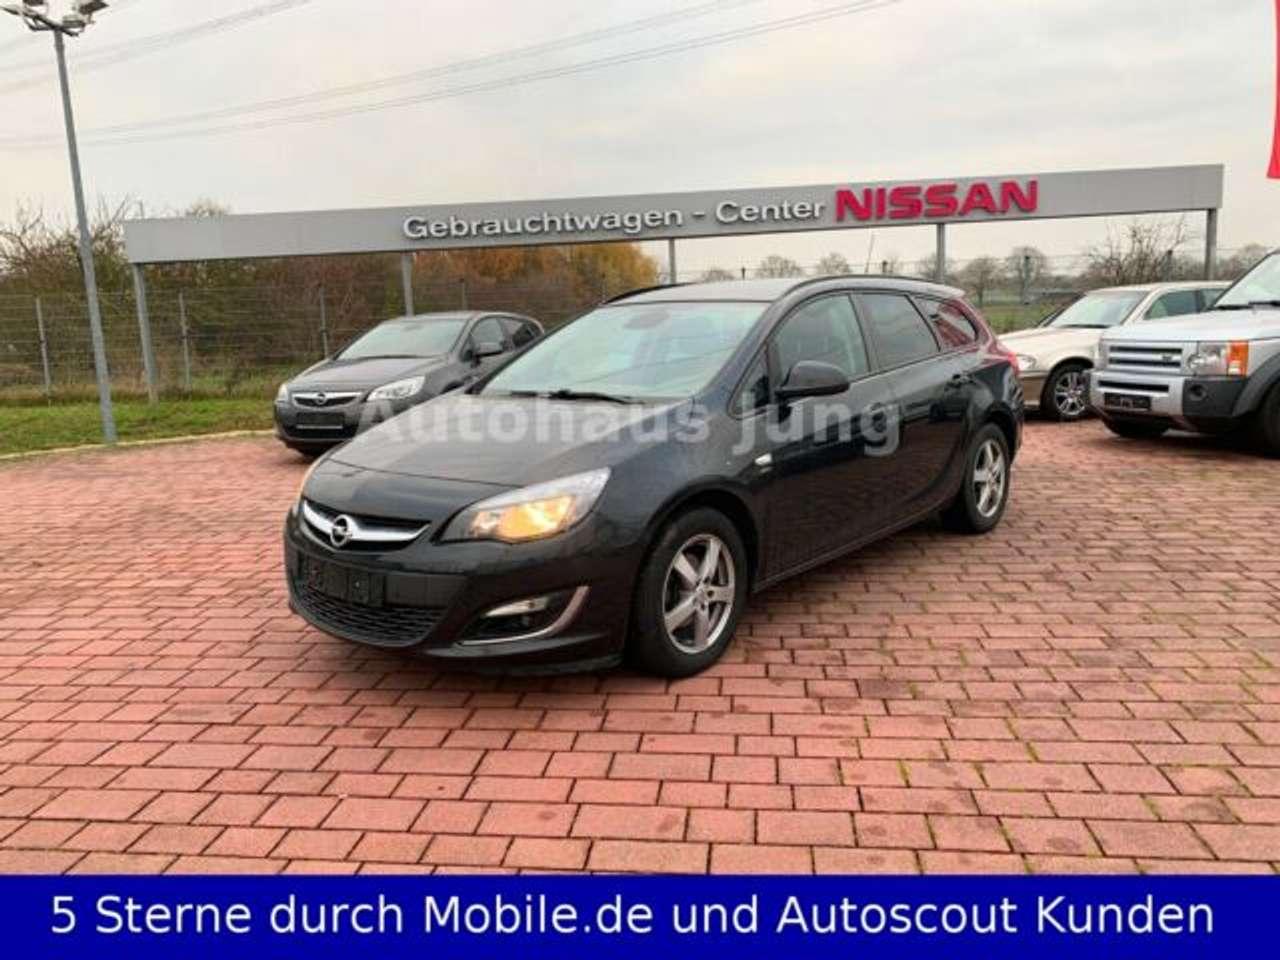 Autos nach Opel Astra Sports Tourer 1.4 Turbo